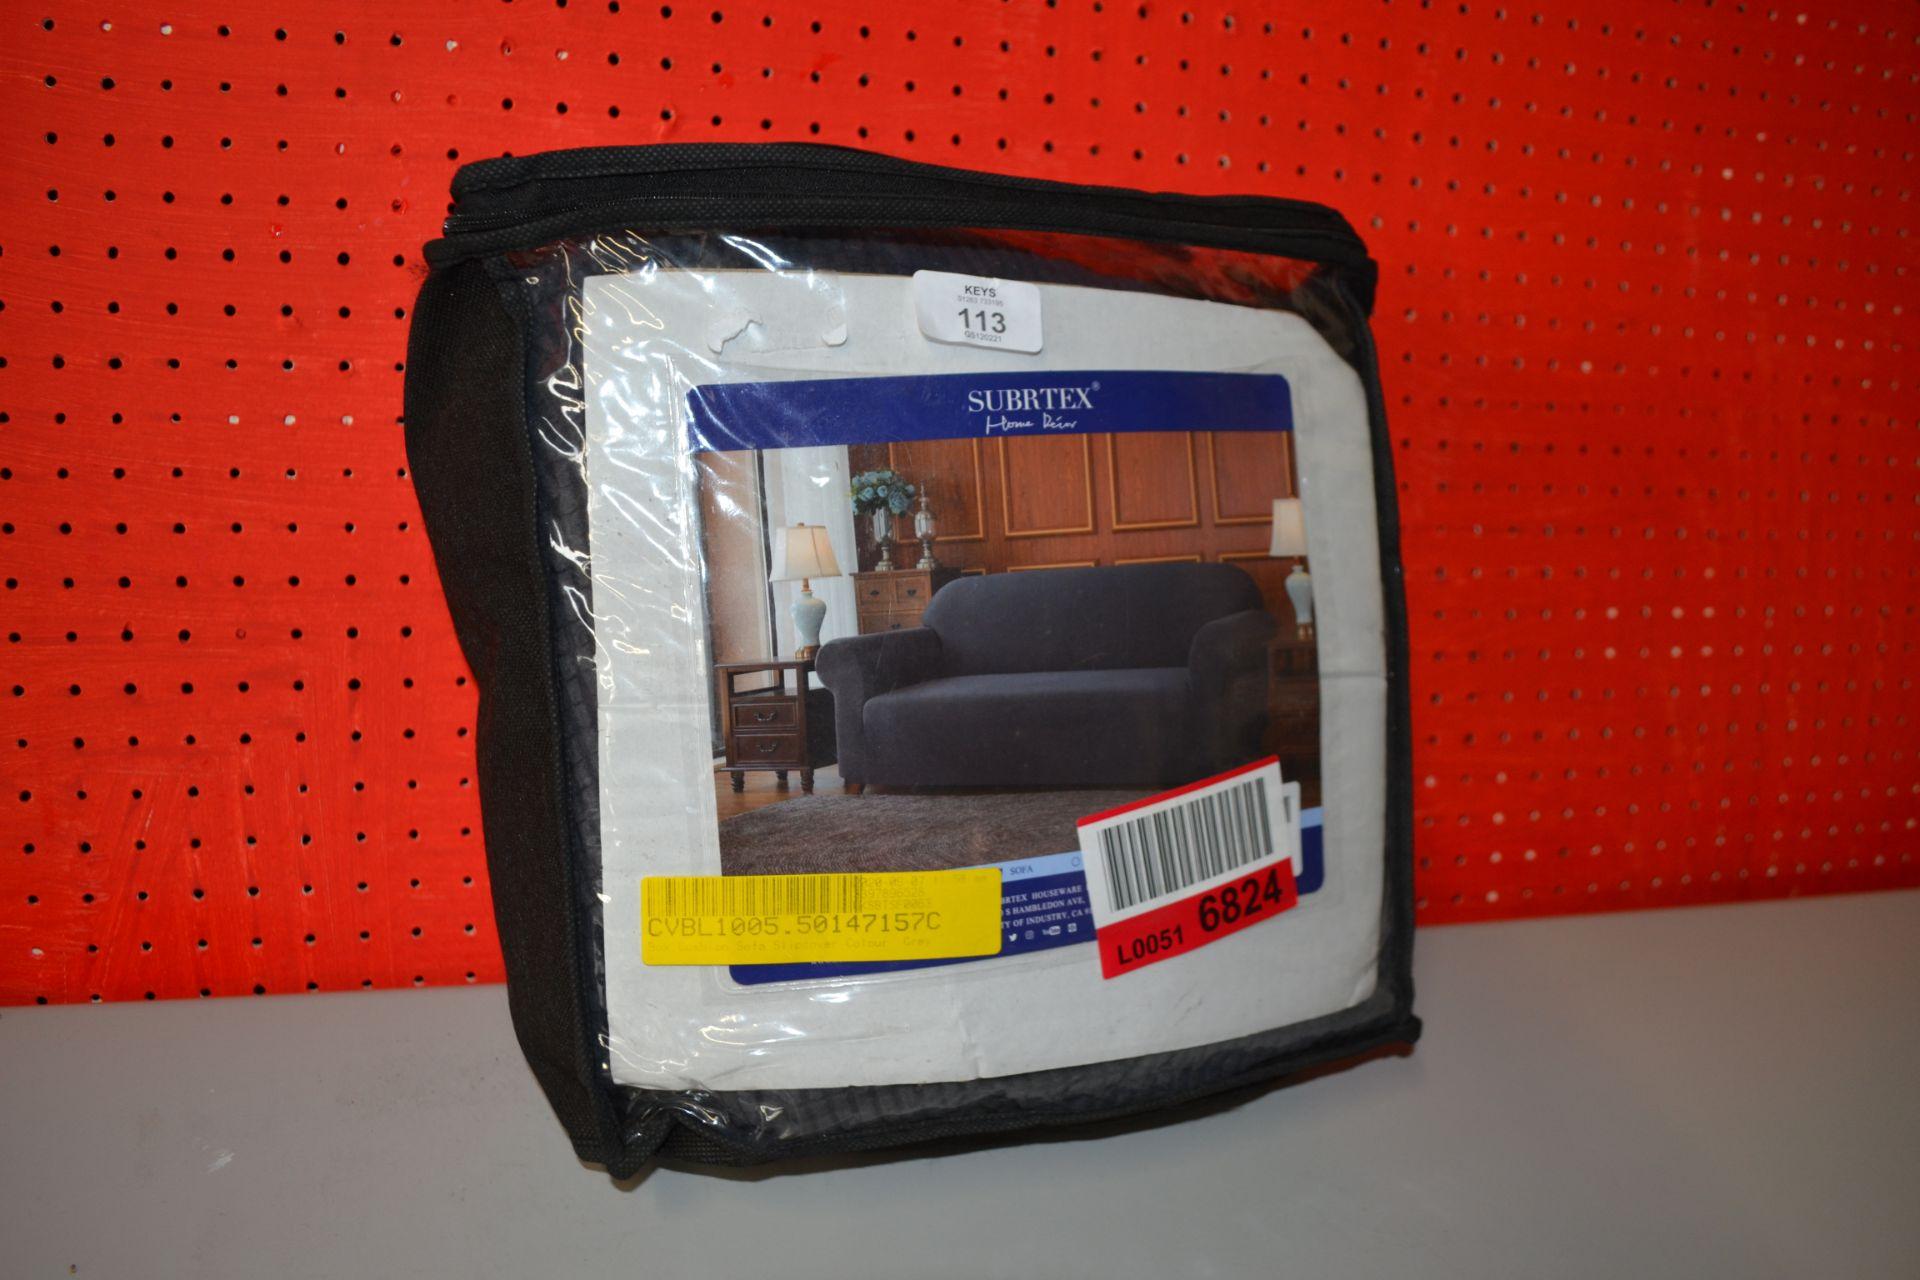 SUBRTEX BOX CUSHION SOFA SLIP COVER IN GREY